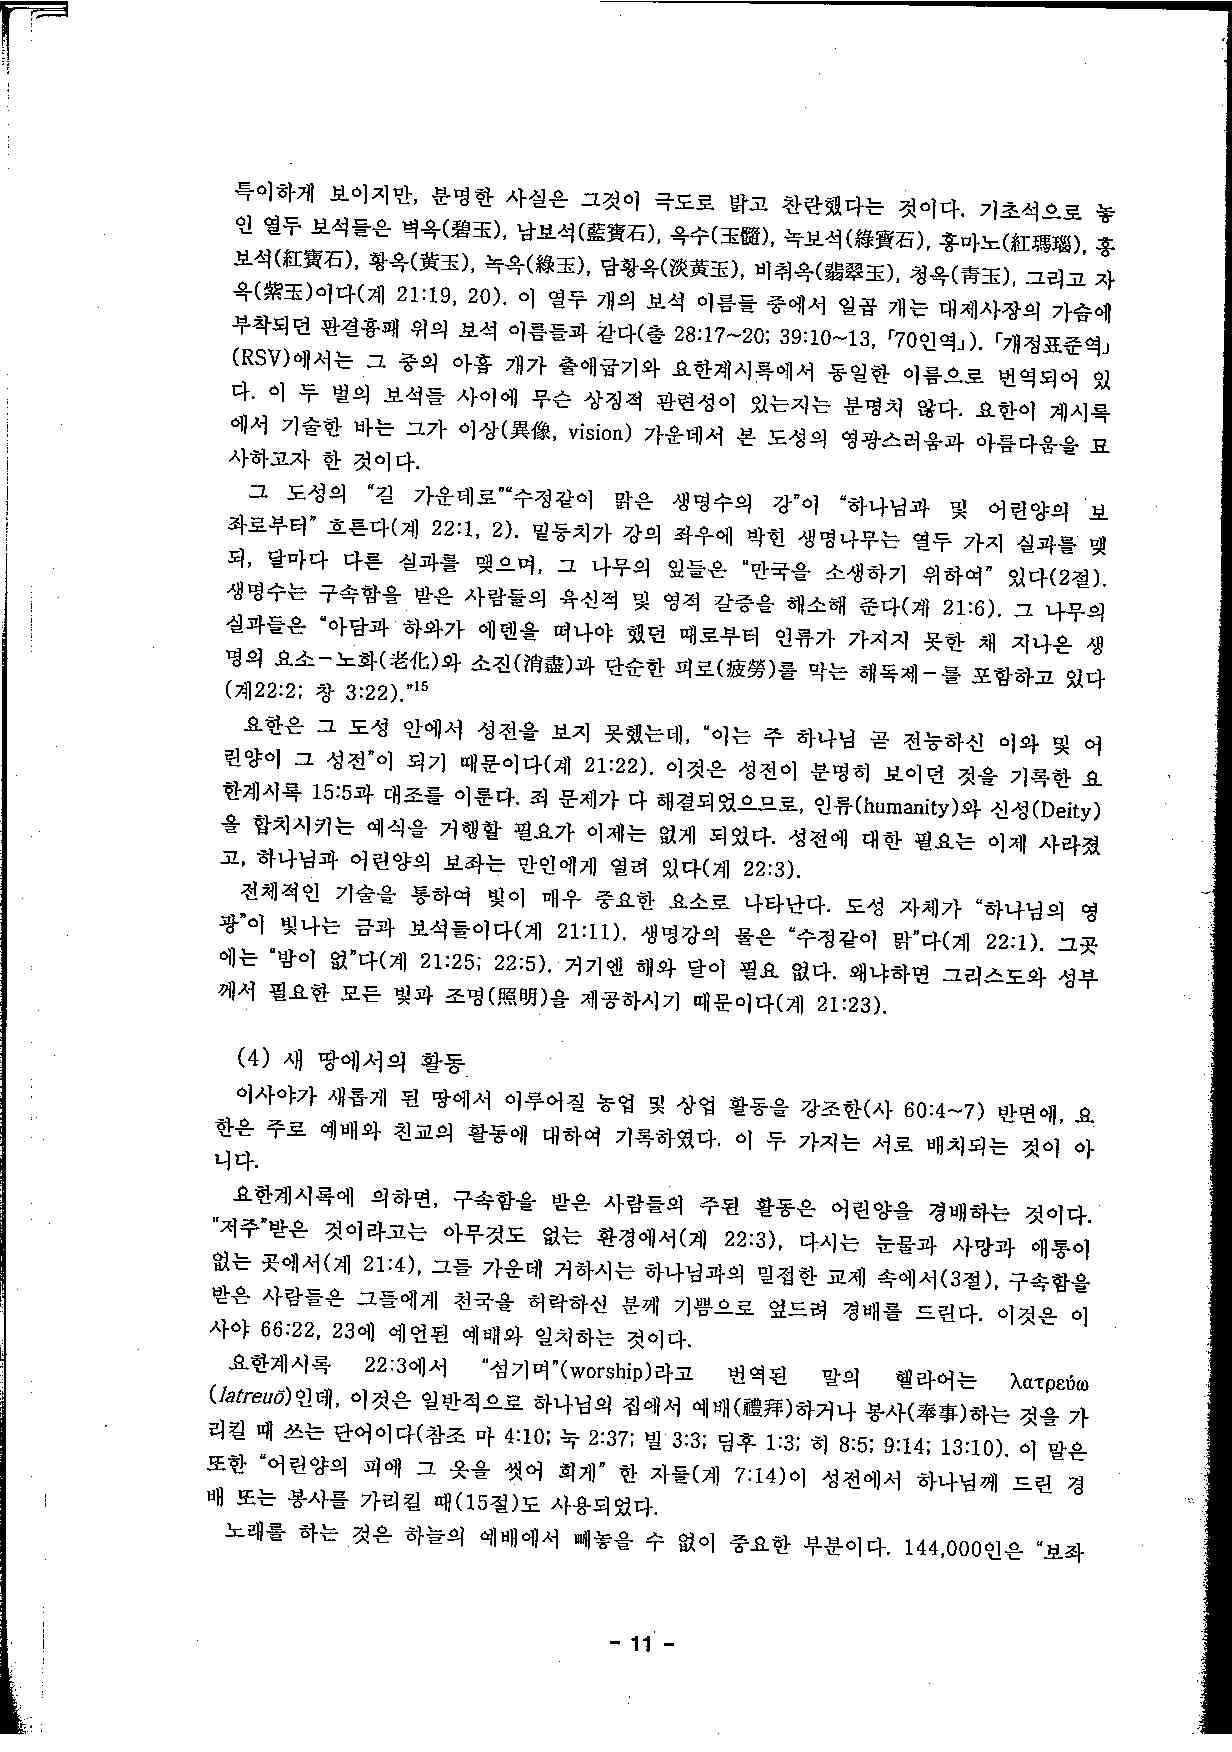 Prof dr Daeguk Nam Last Lecture 2008 (12).jpg